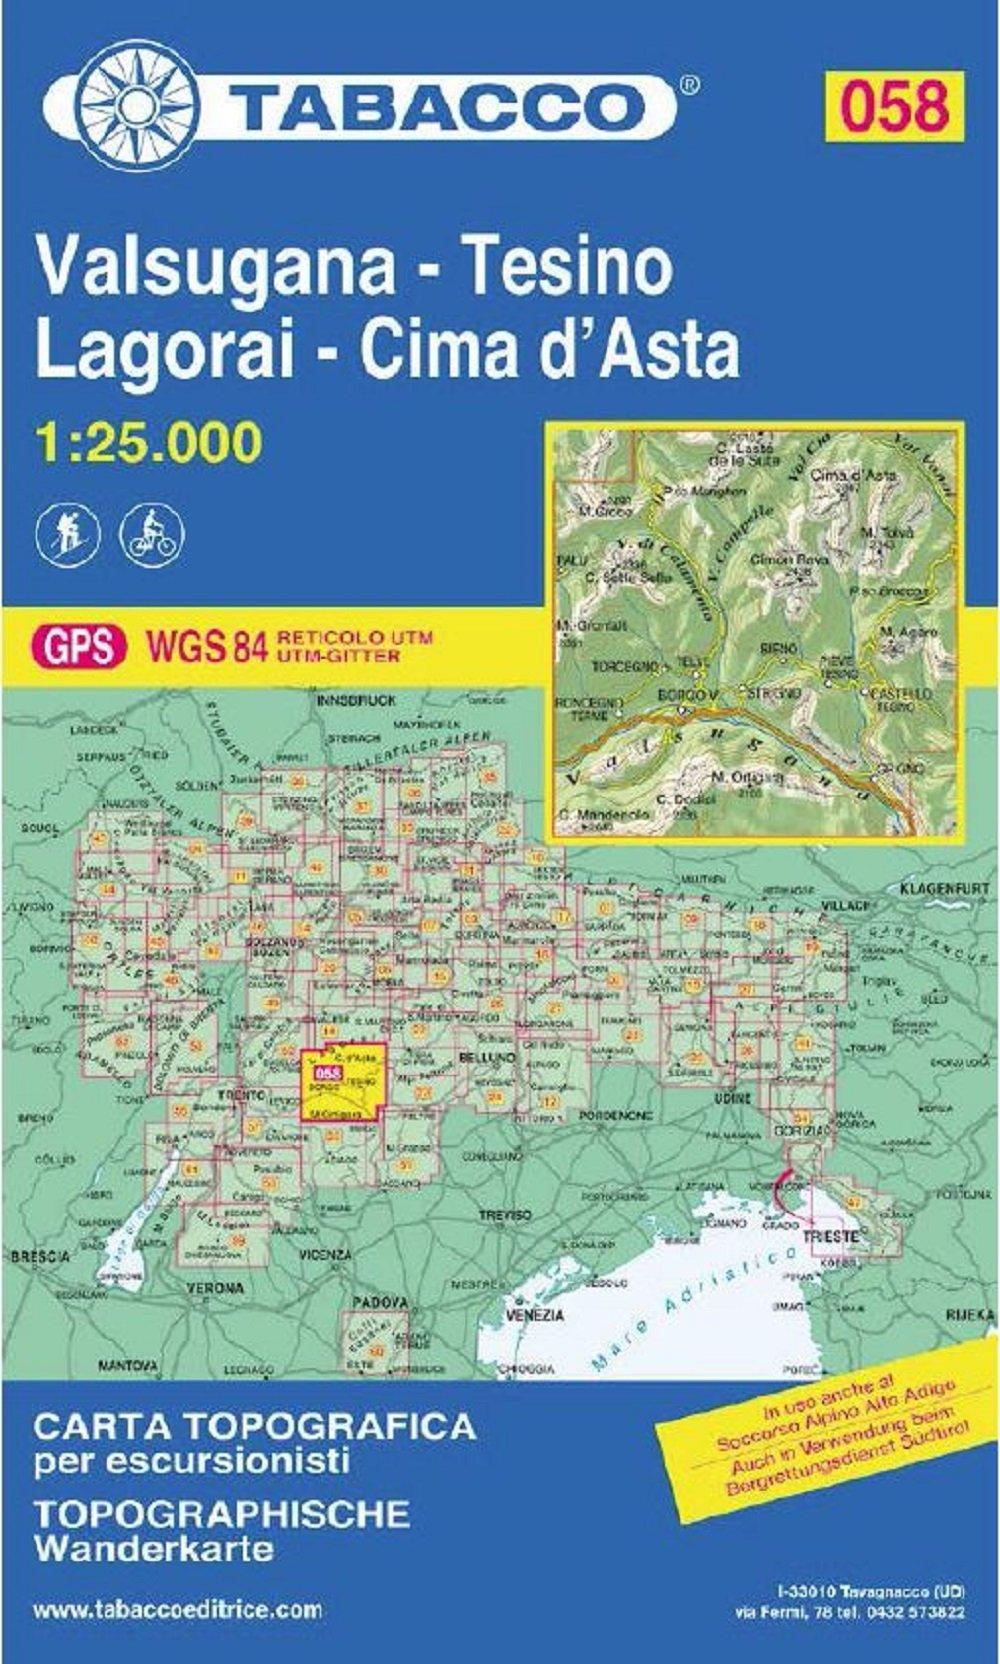 Tabacco Wandern 1 : 25 000 Valsugana - Tesino - Lagorai - Cime d'Asta